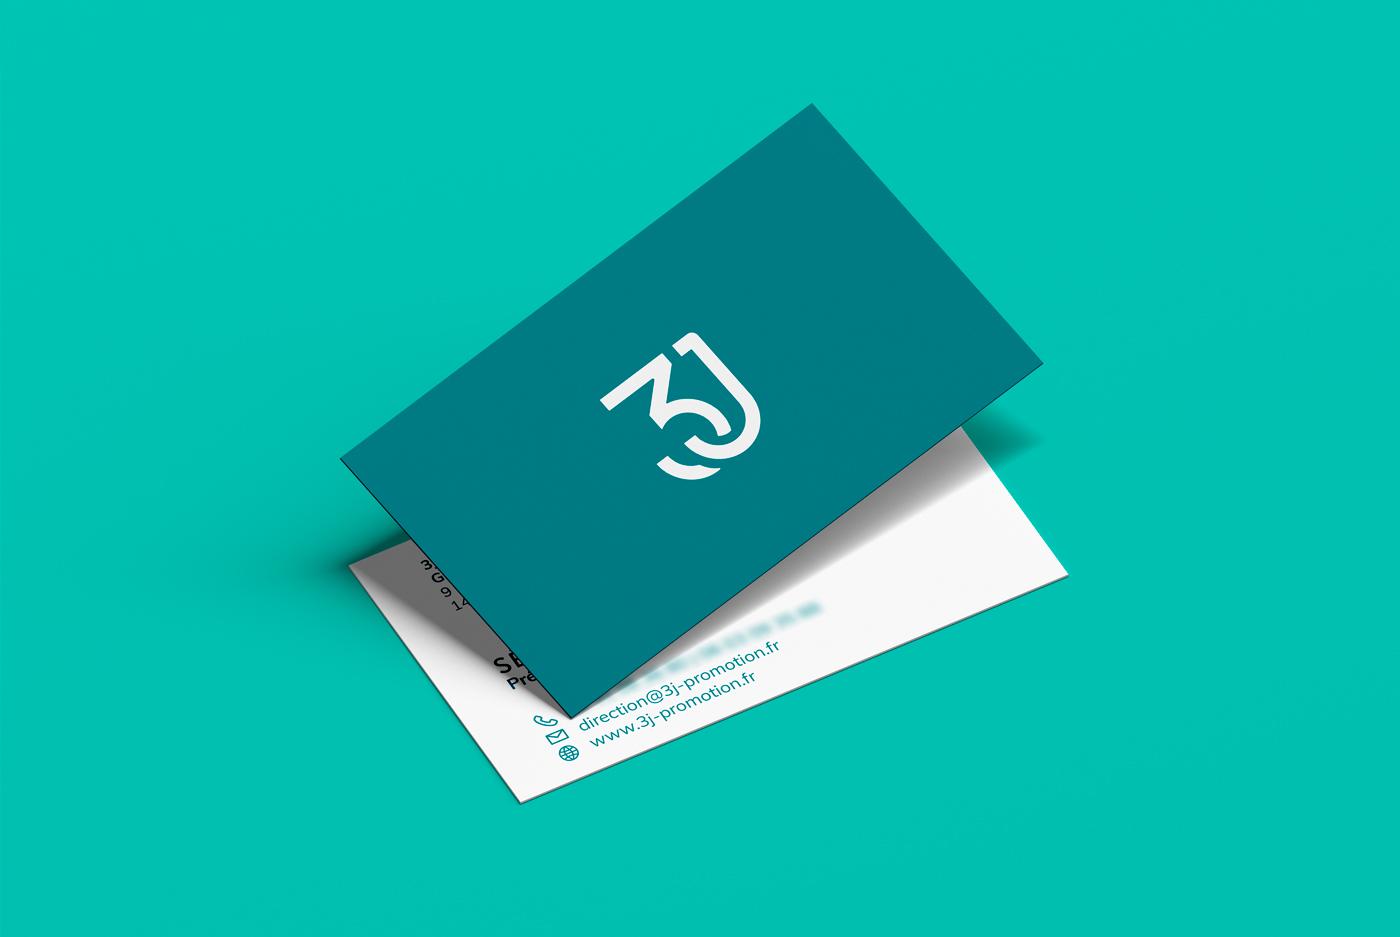 3J immobilier business card - mathieu Dupuis Freelance